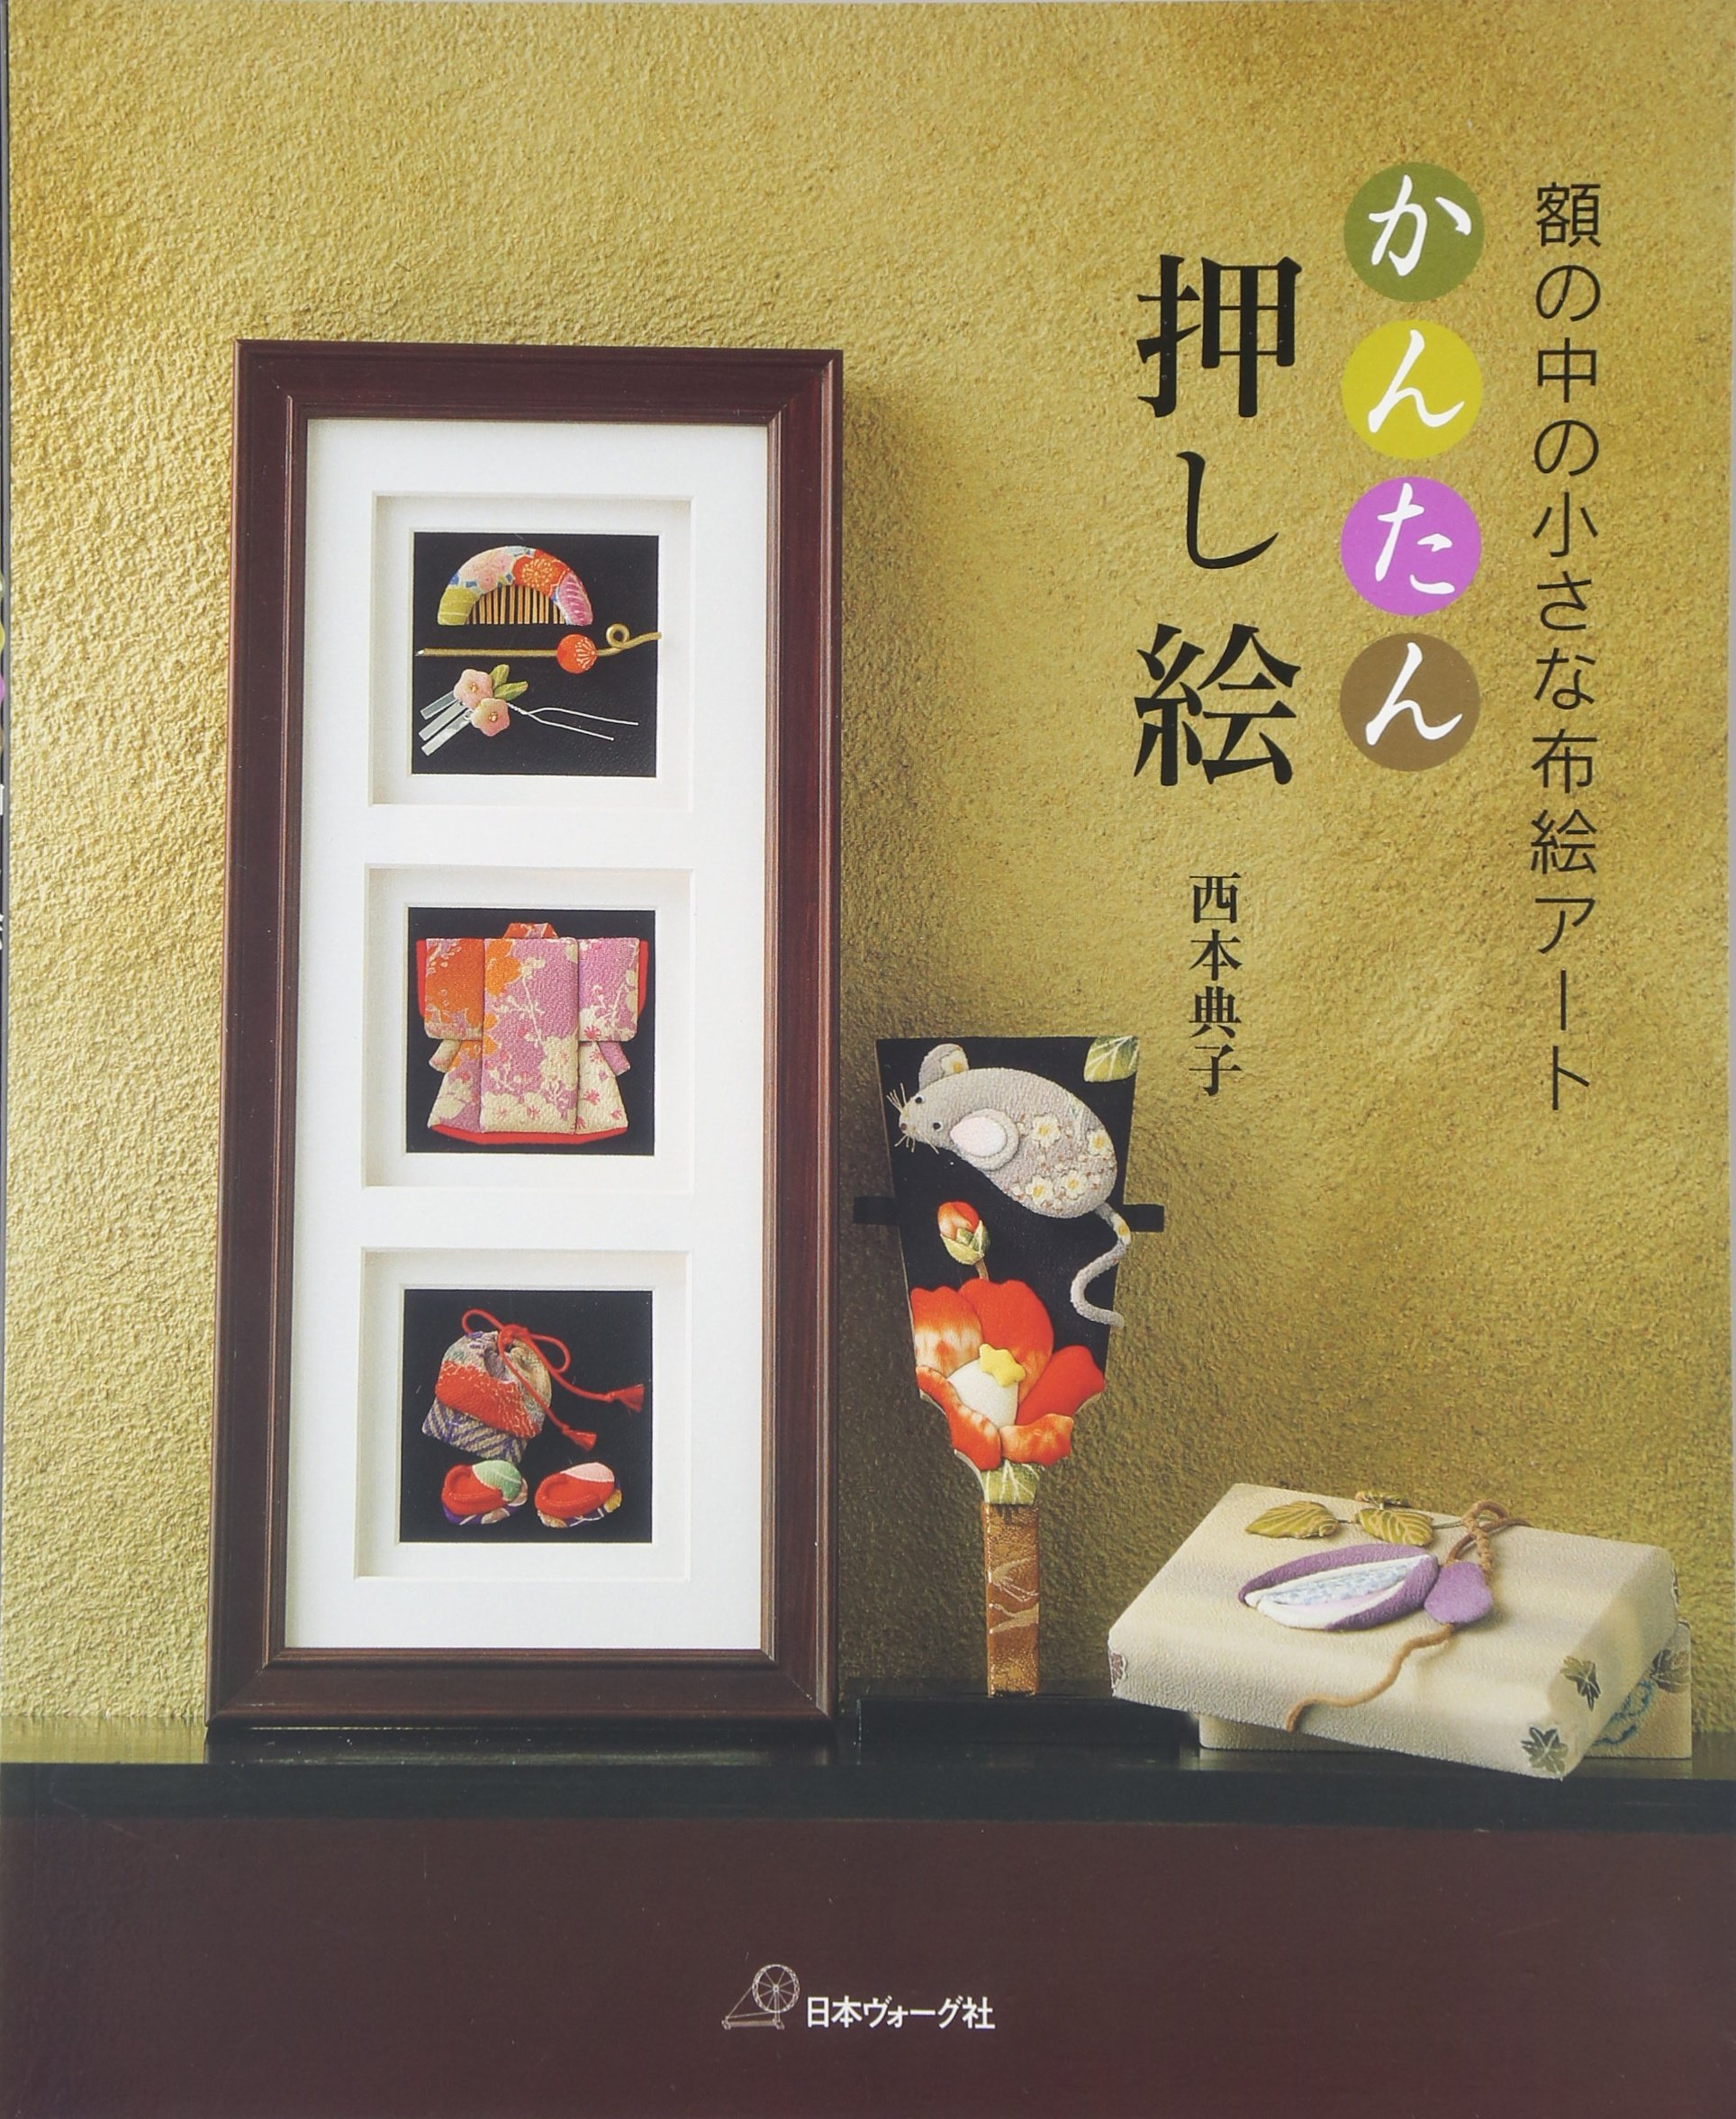 Easy teaching by Noriko Nishimoto